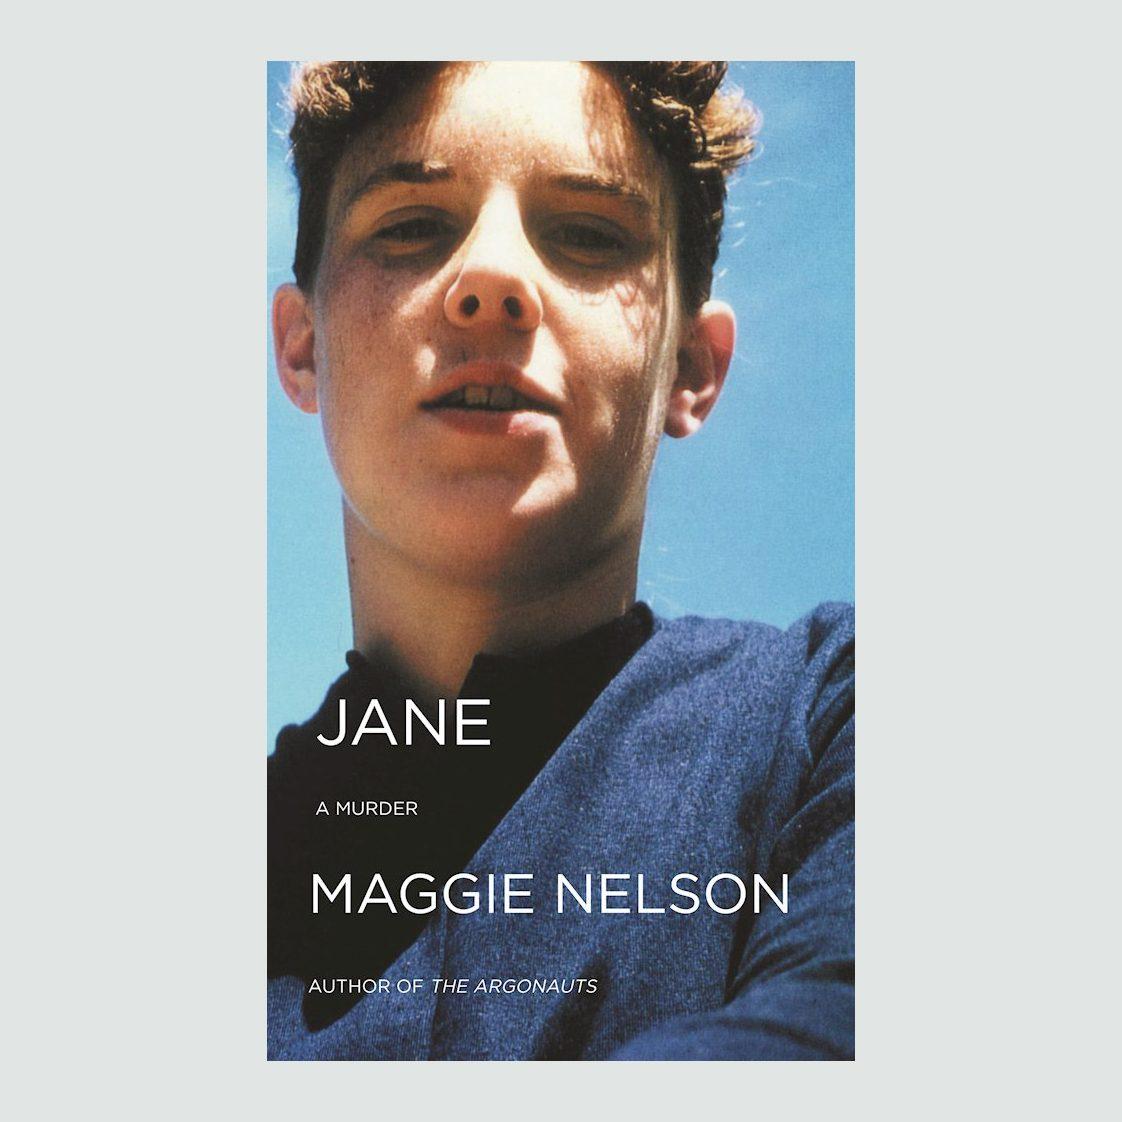 Maggie Nelson author